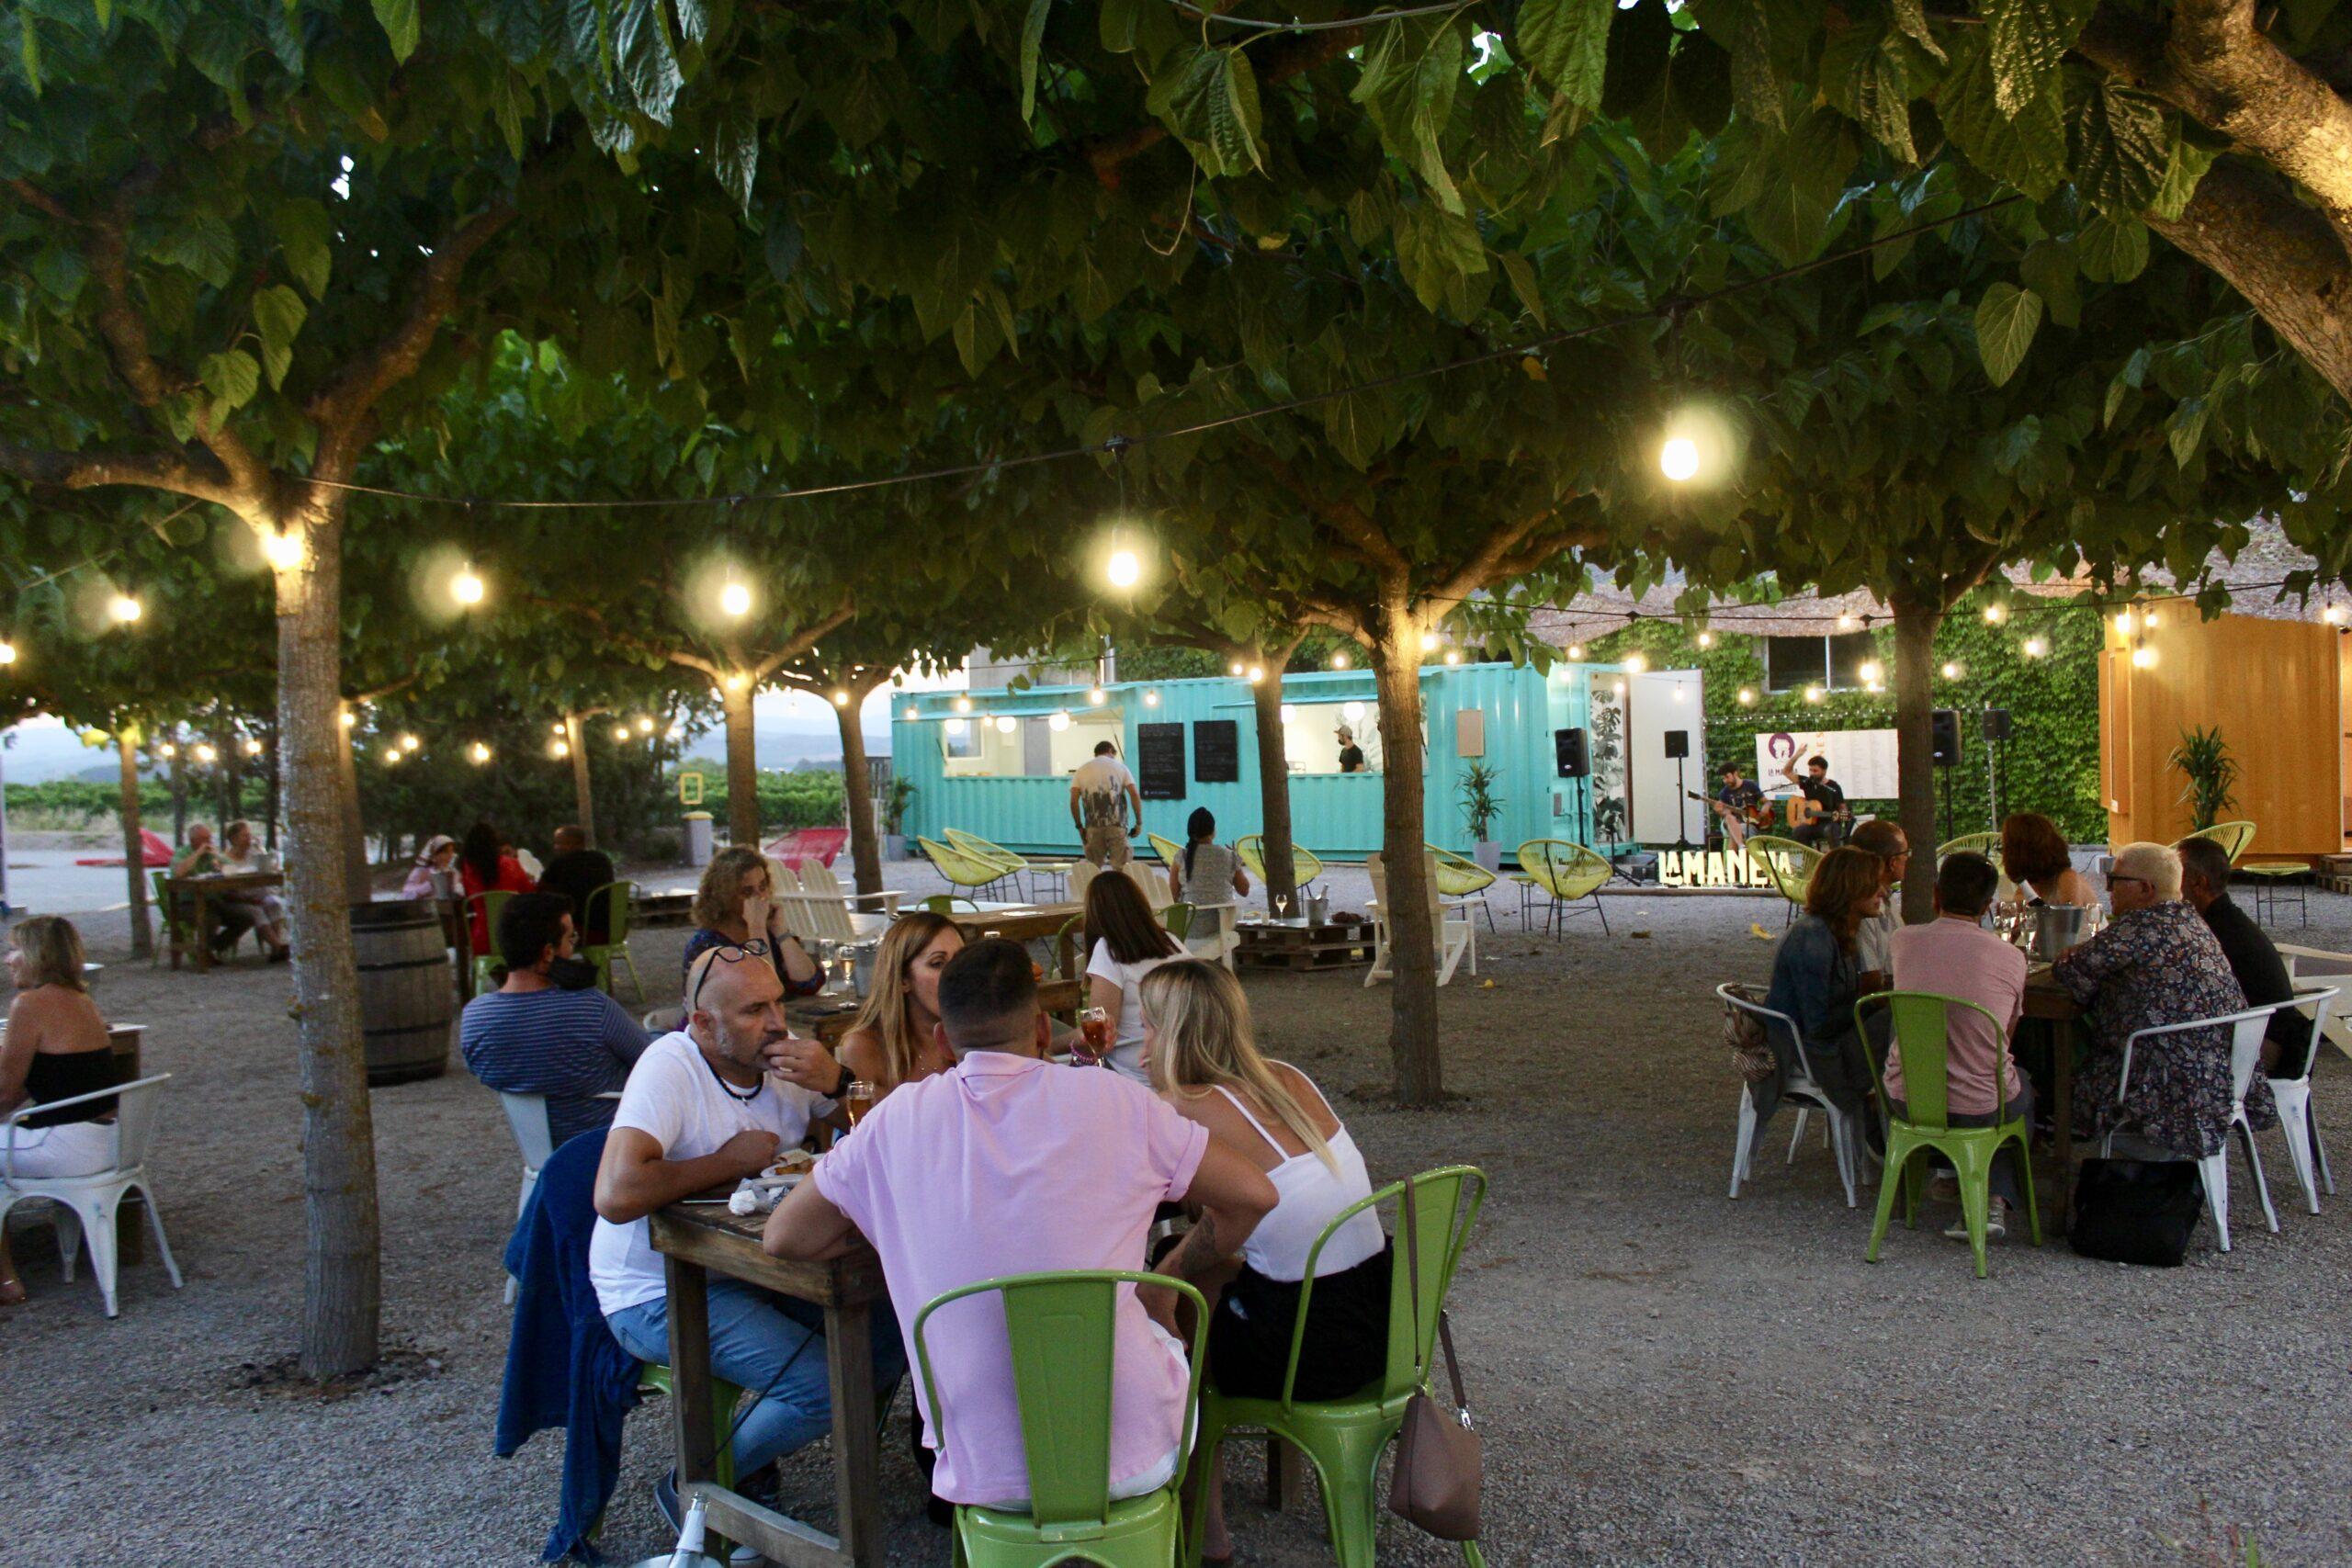 La Manela by Artcava, nits d'estiu entre vinyes a Masia Can Batlle